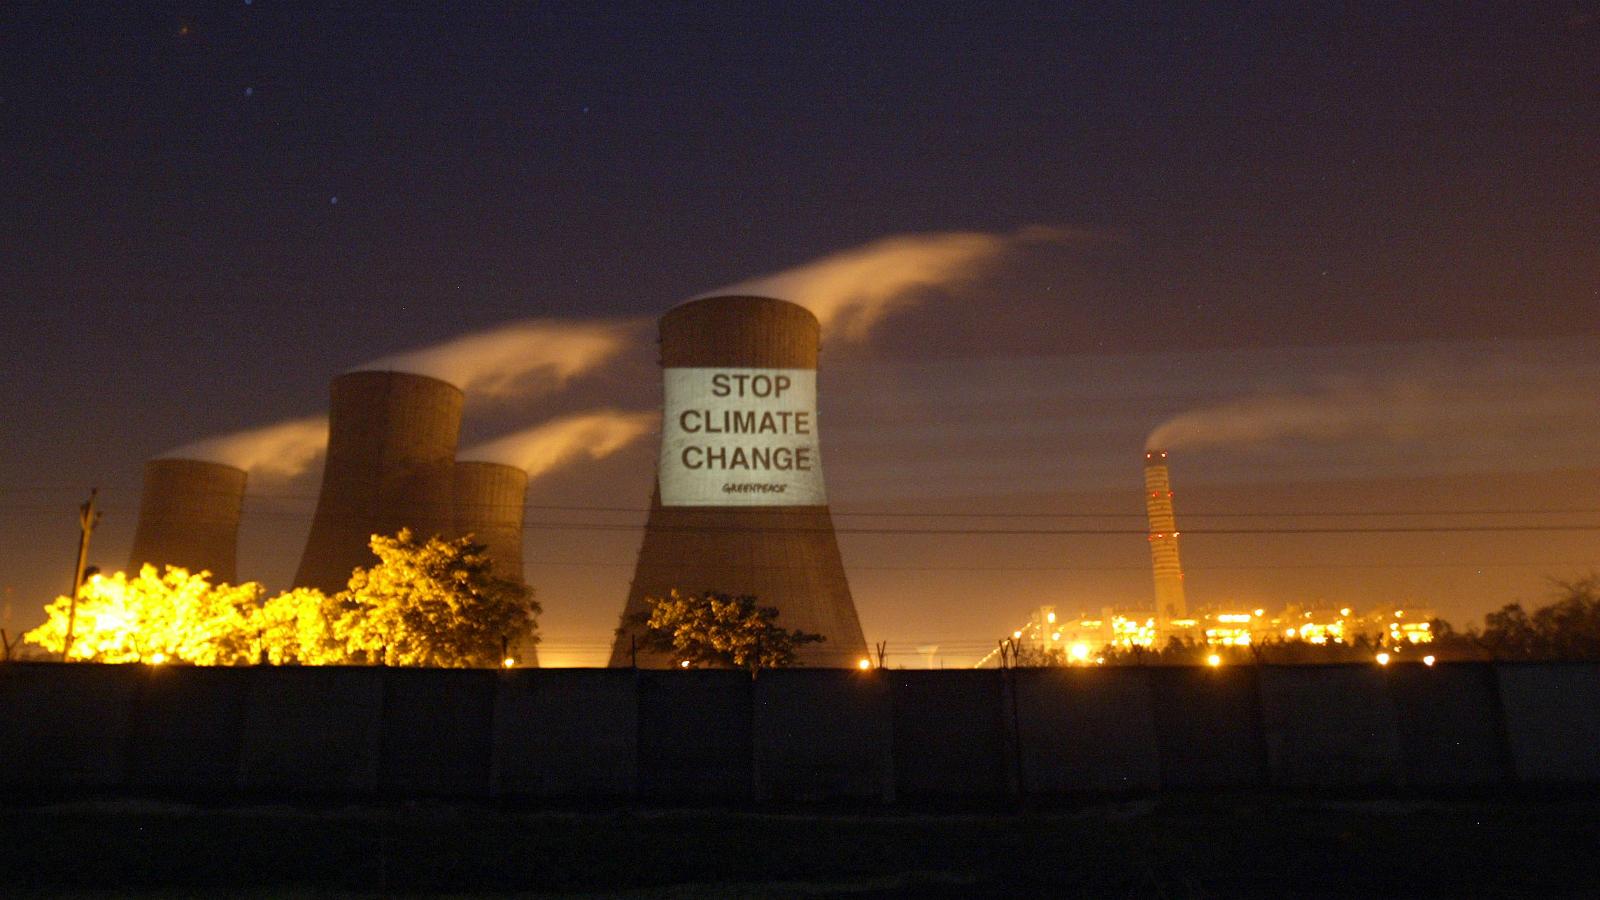 A sluggish economy and cheap renewables are choking India's